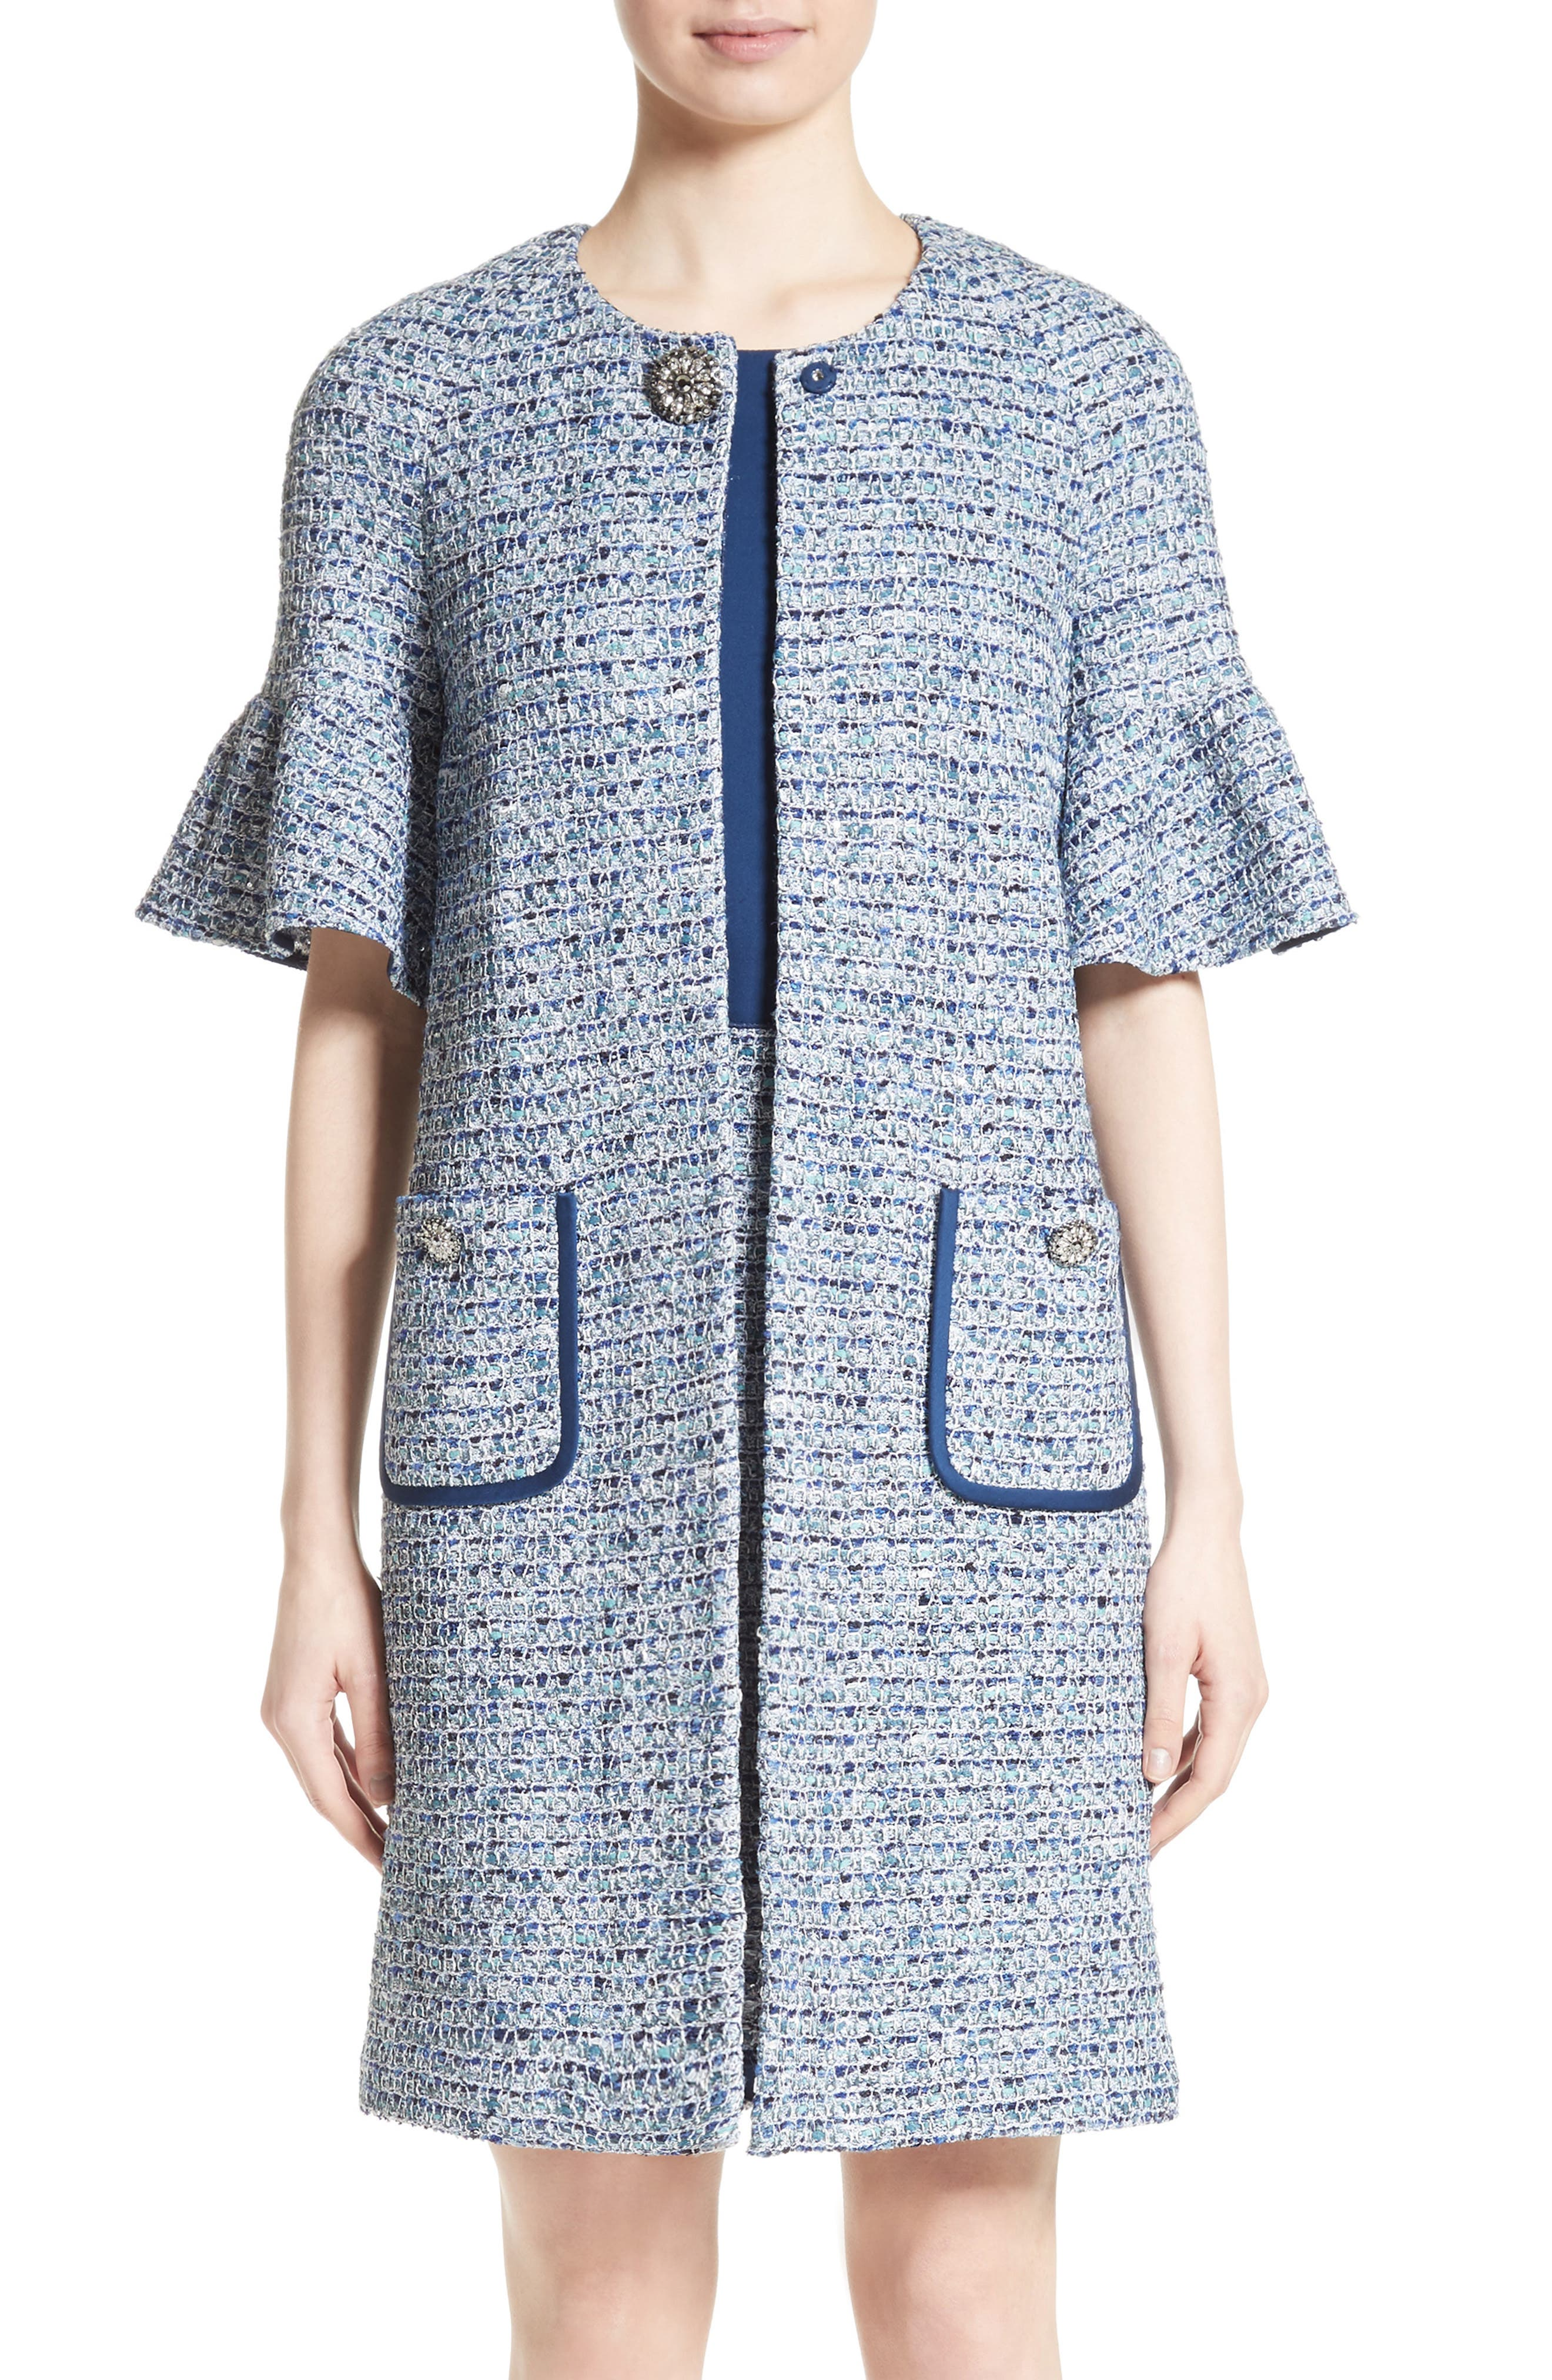 Alternate Image 1 Selected - St. John Collection Kiara Tweed Bell Sleeve Jacket